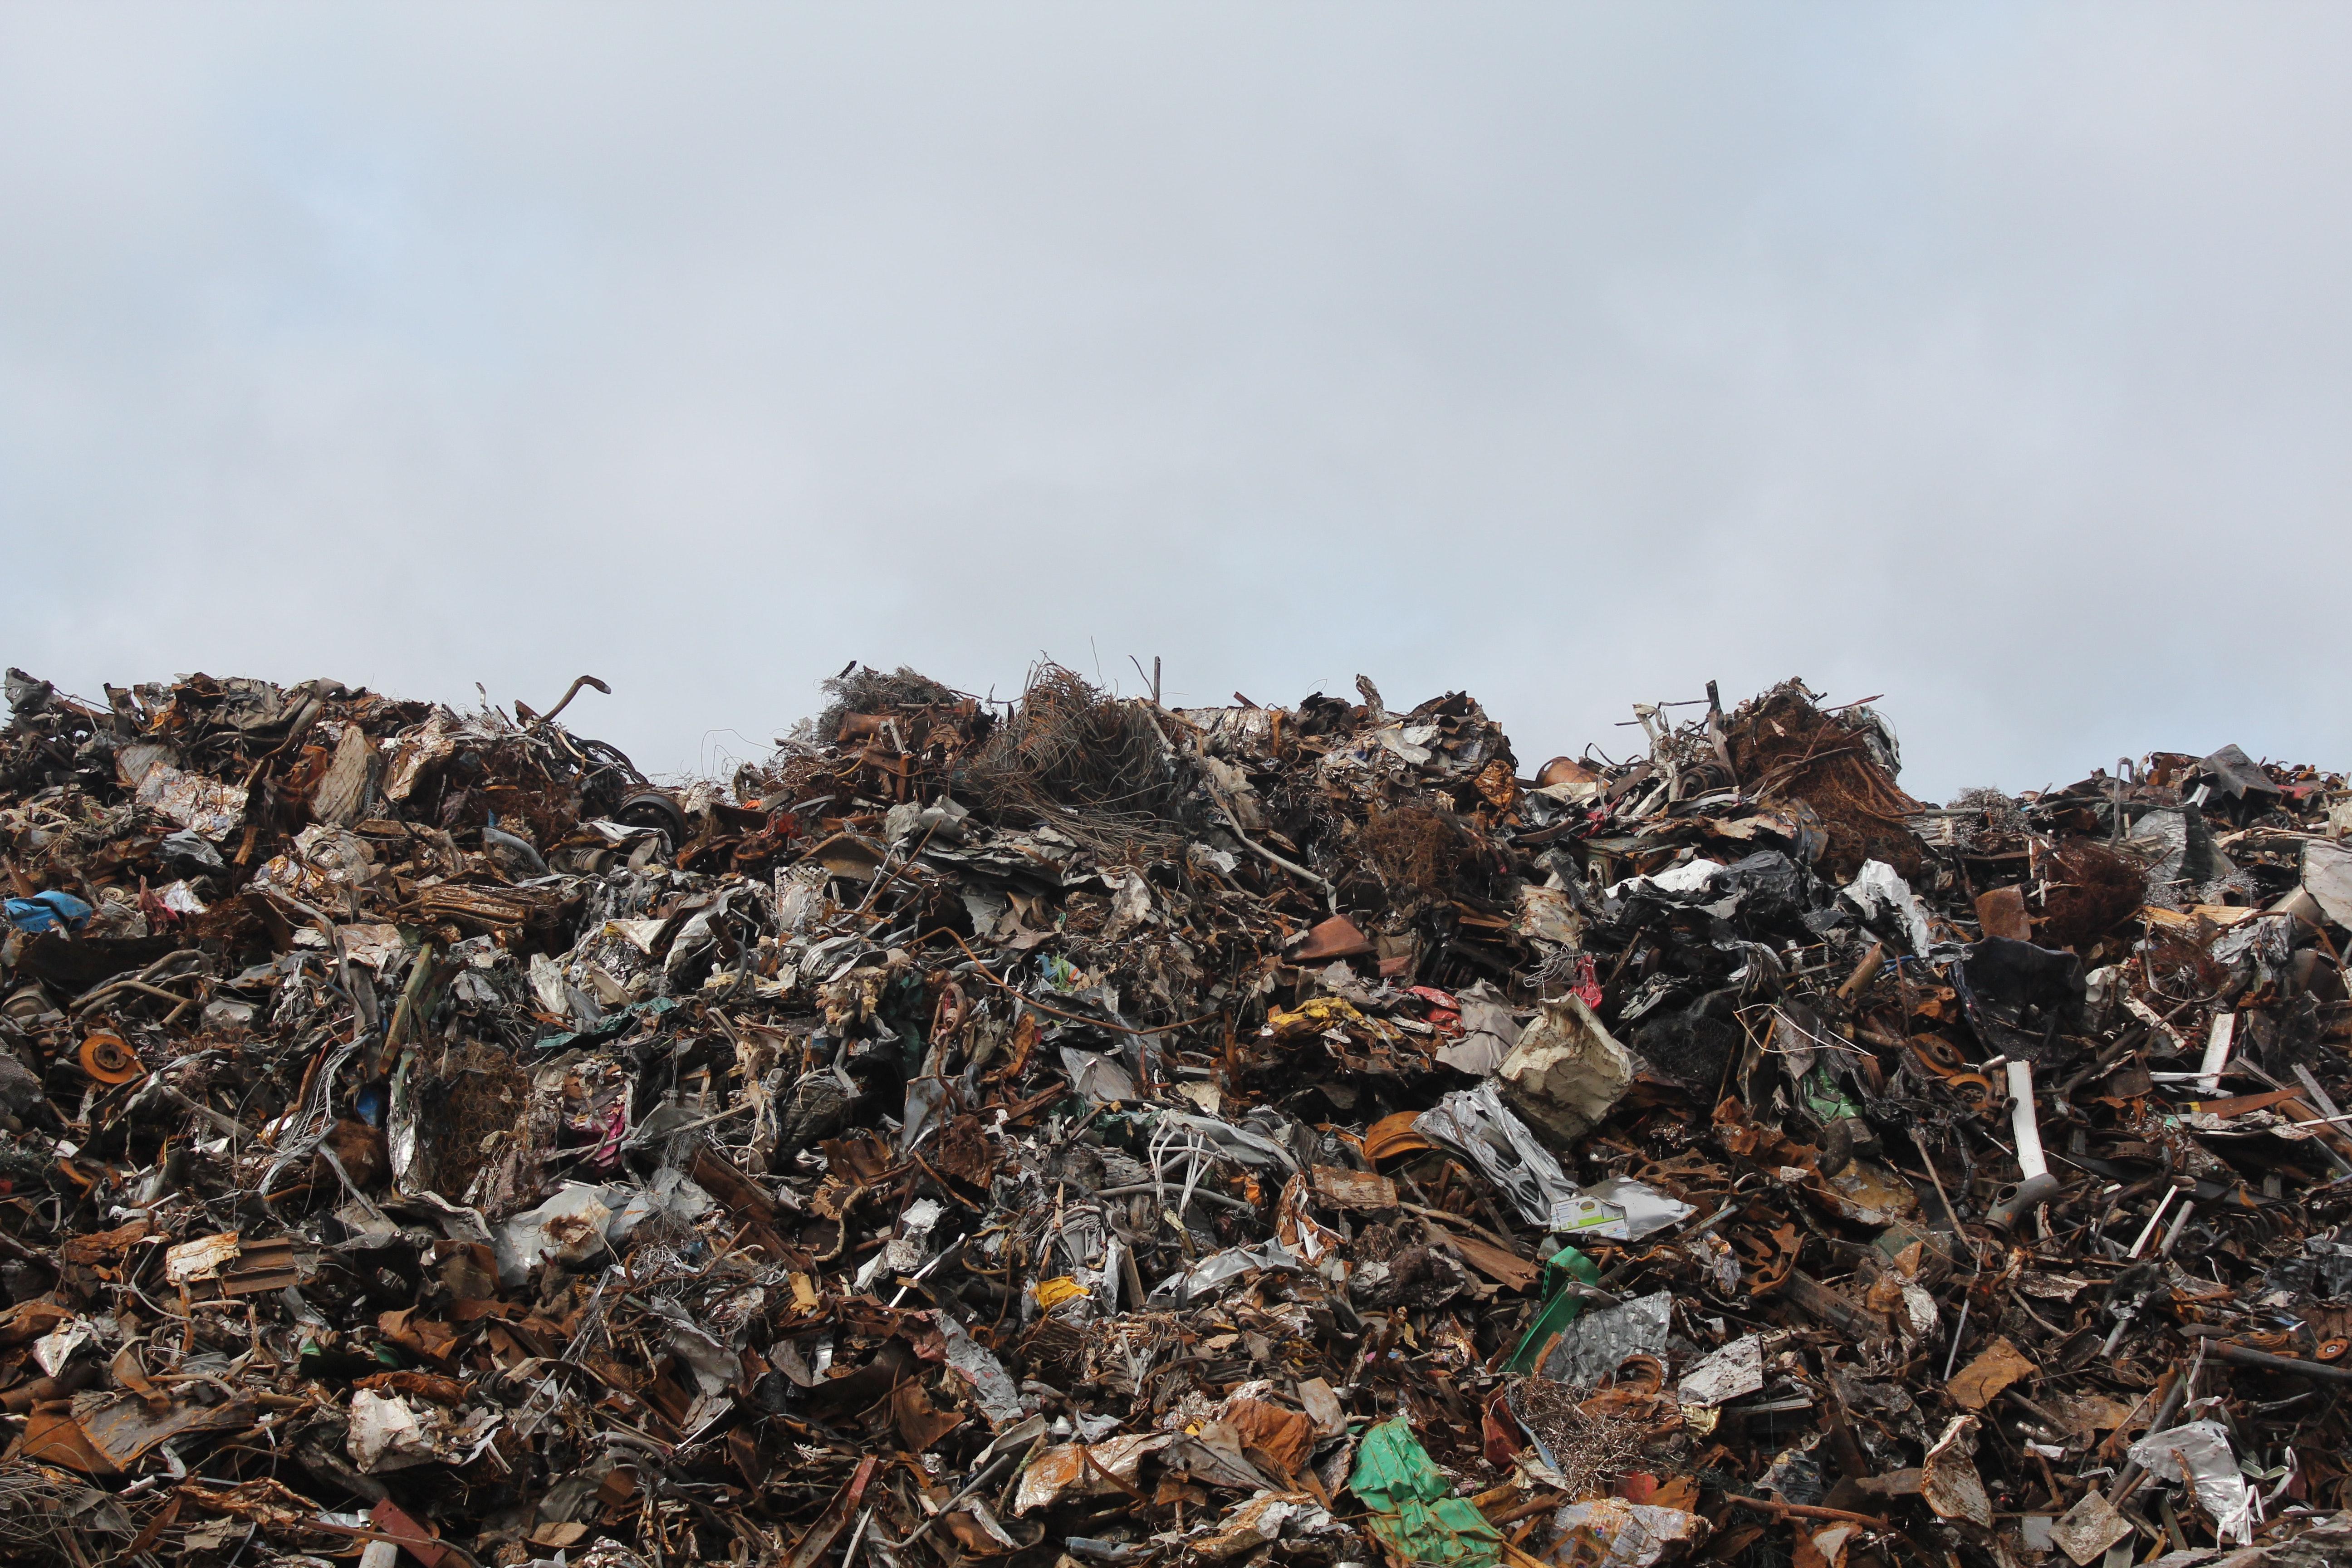 temperature___humidity_disposal-dump-garbage-128421.jpg